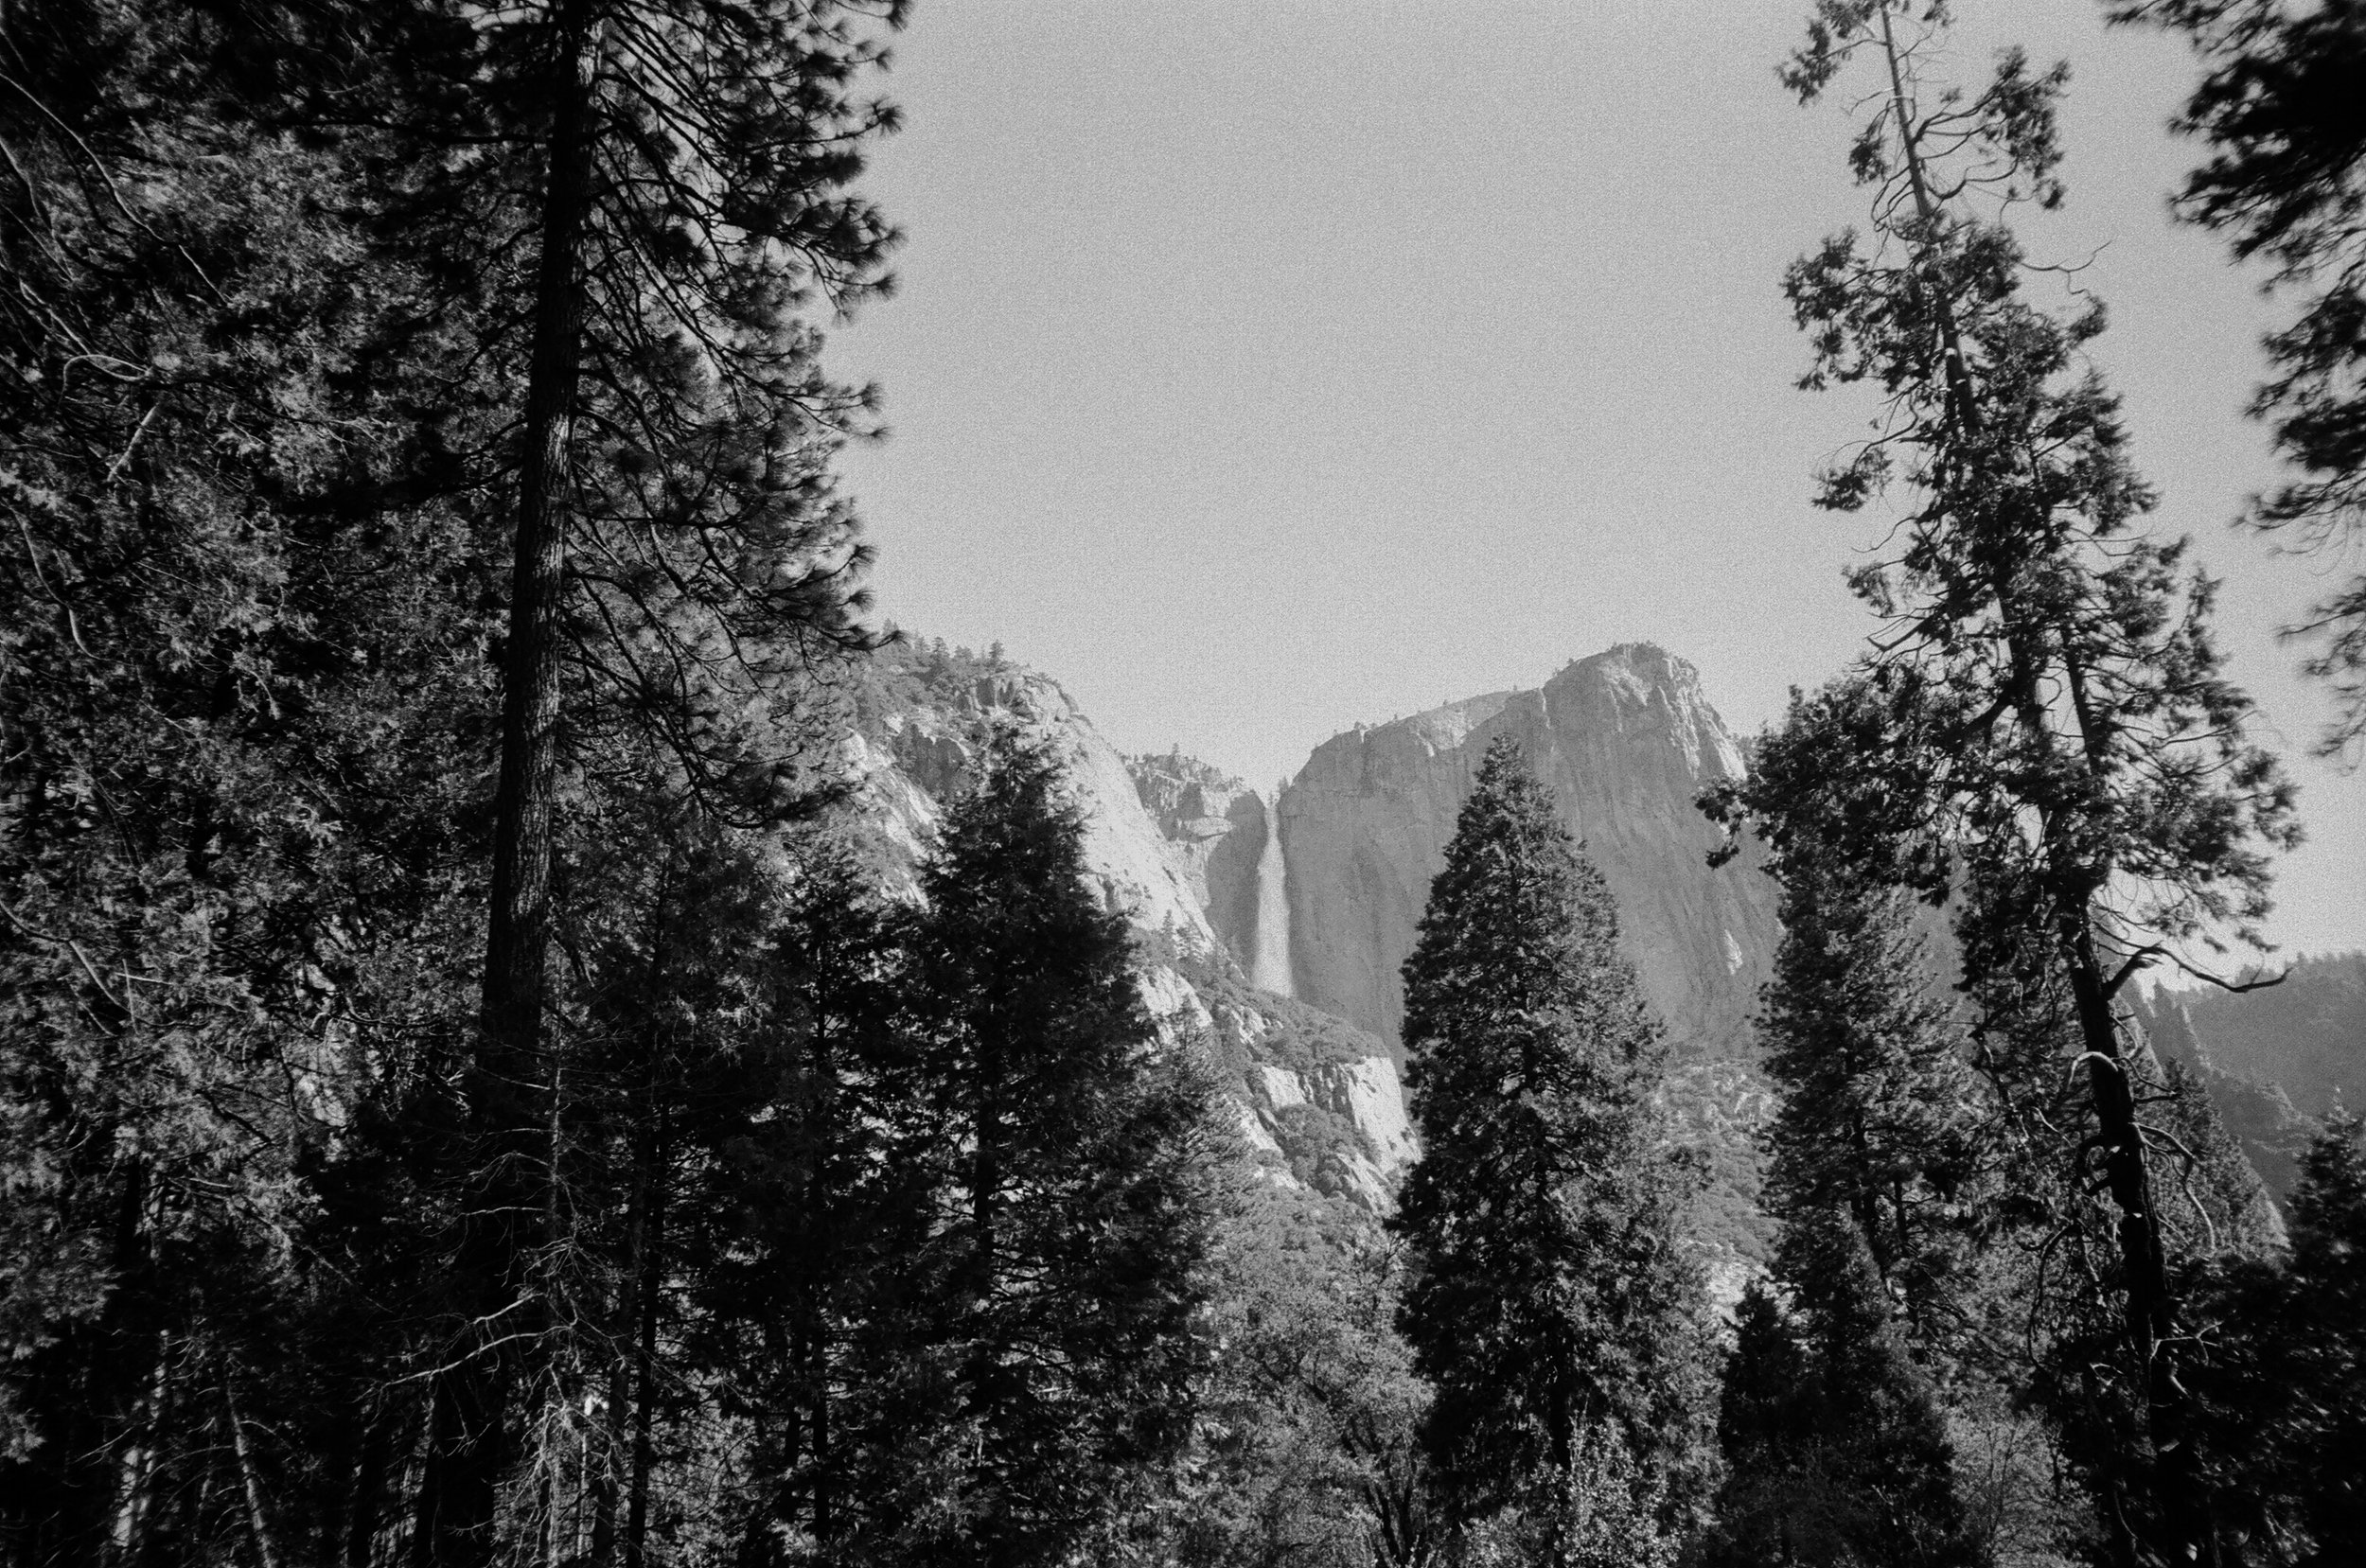 waterfalls in Yosemite valley